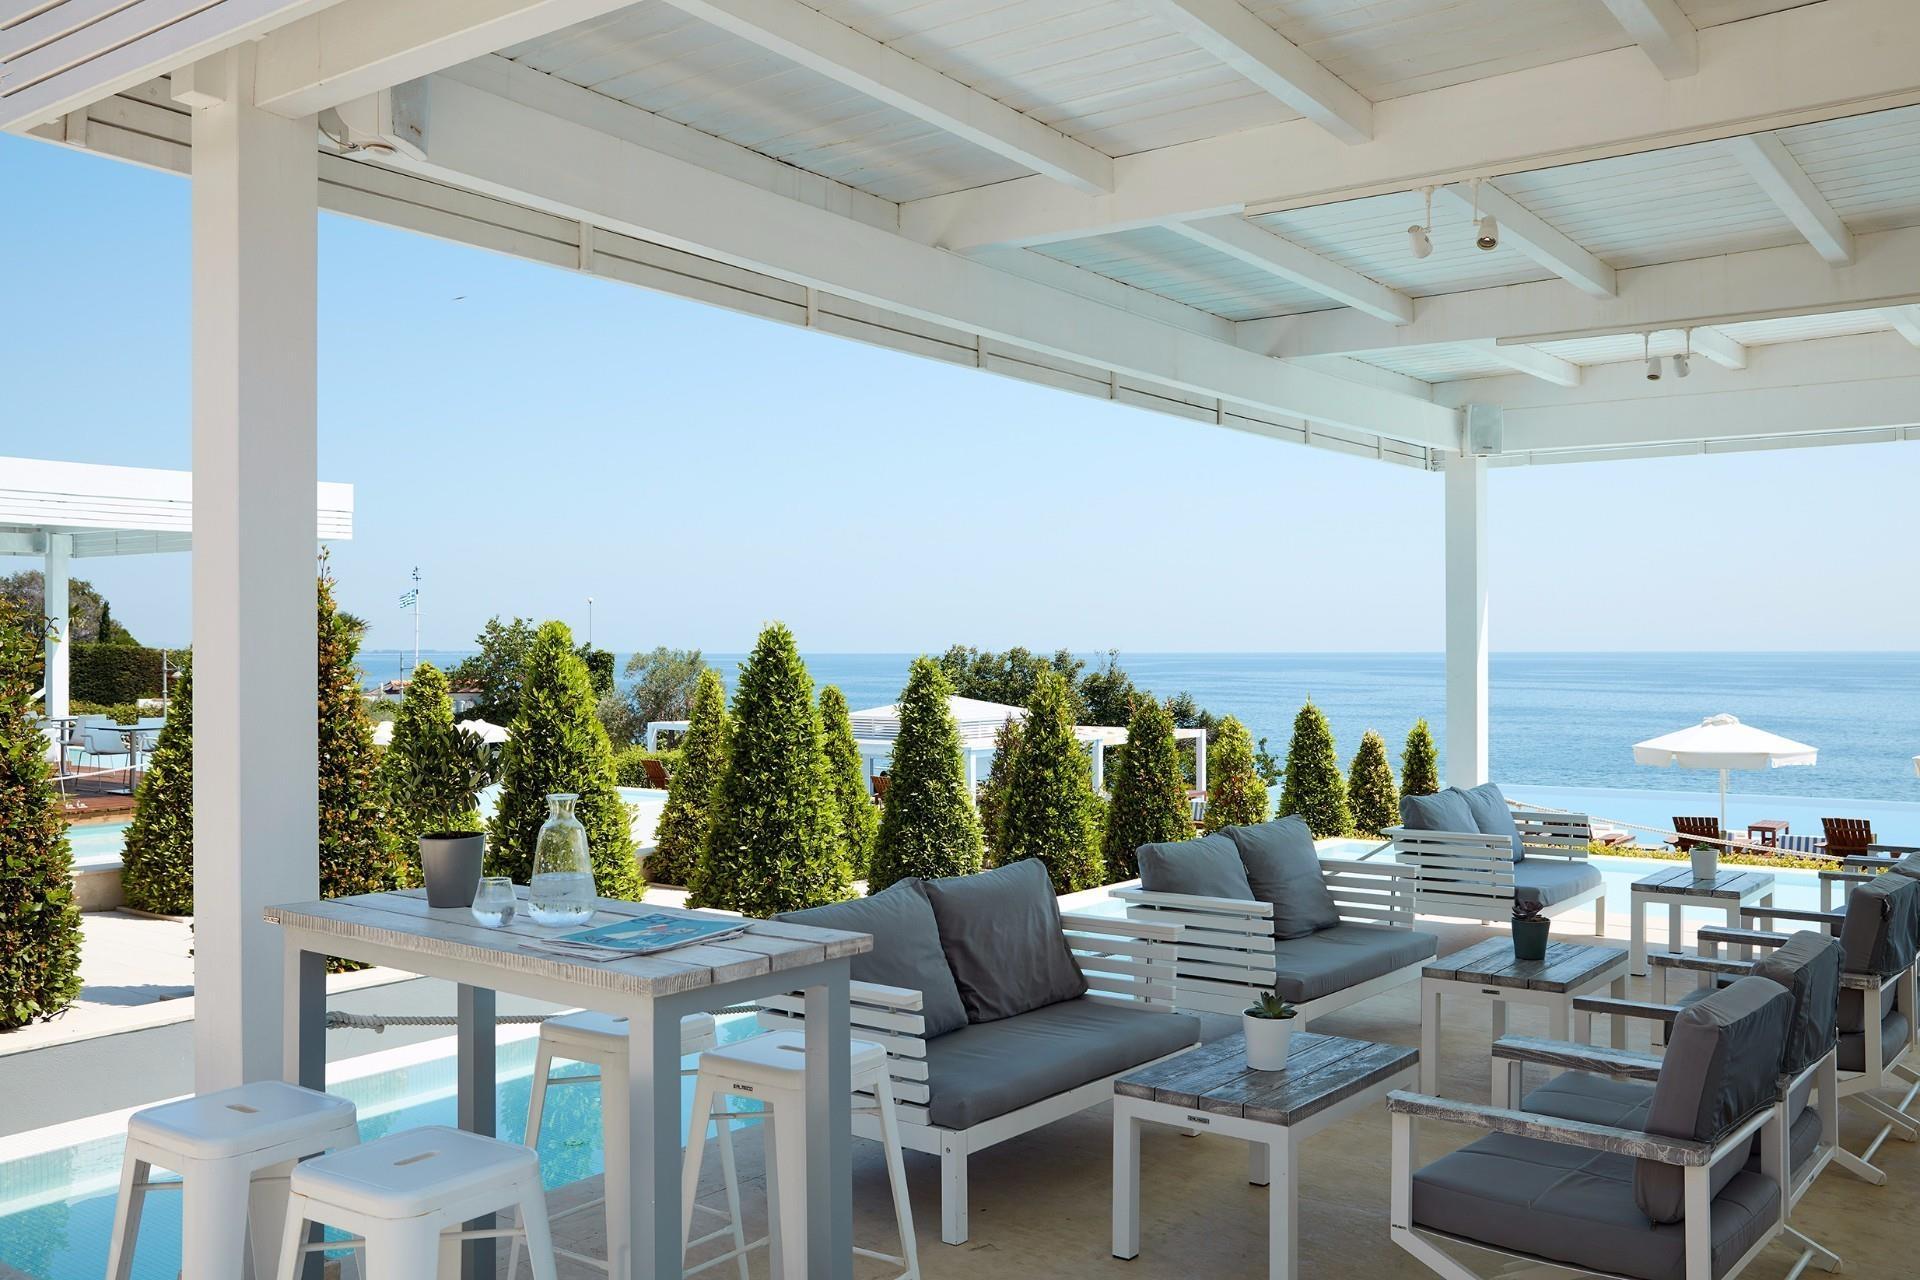 cavo-olympo-luxury-hotel-spa-genel-0016